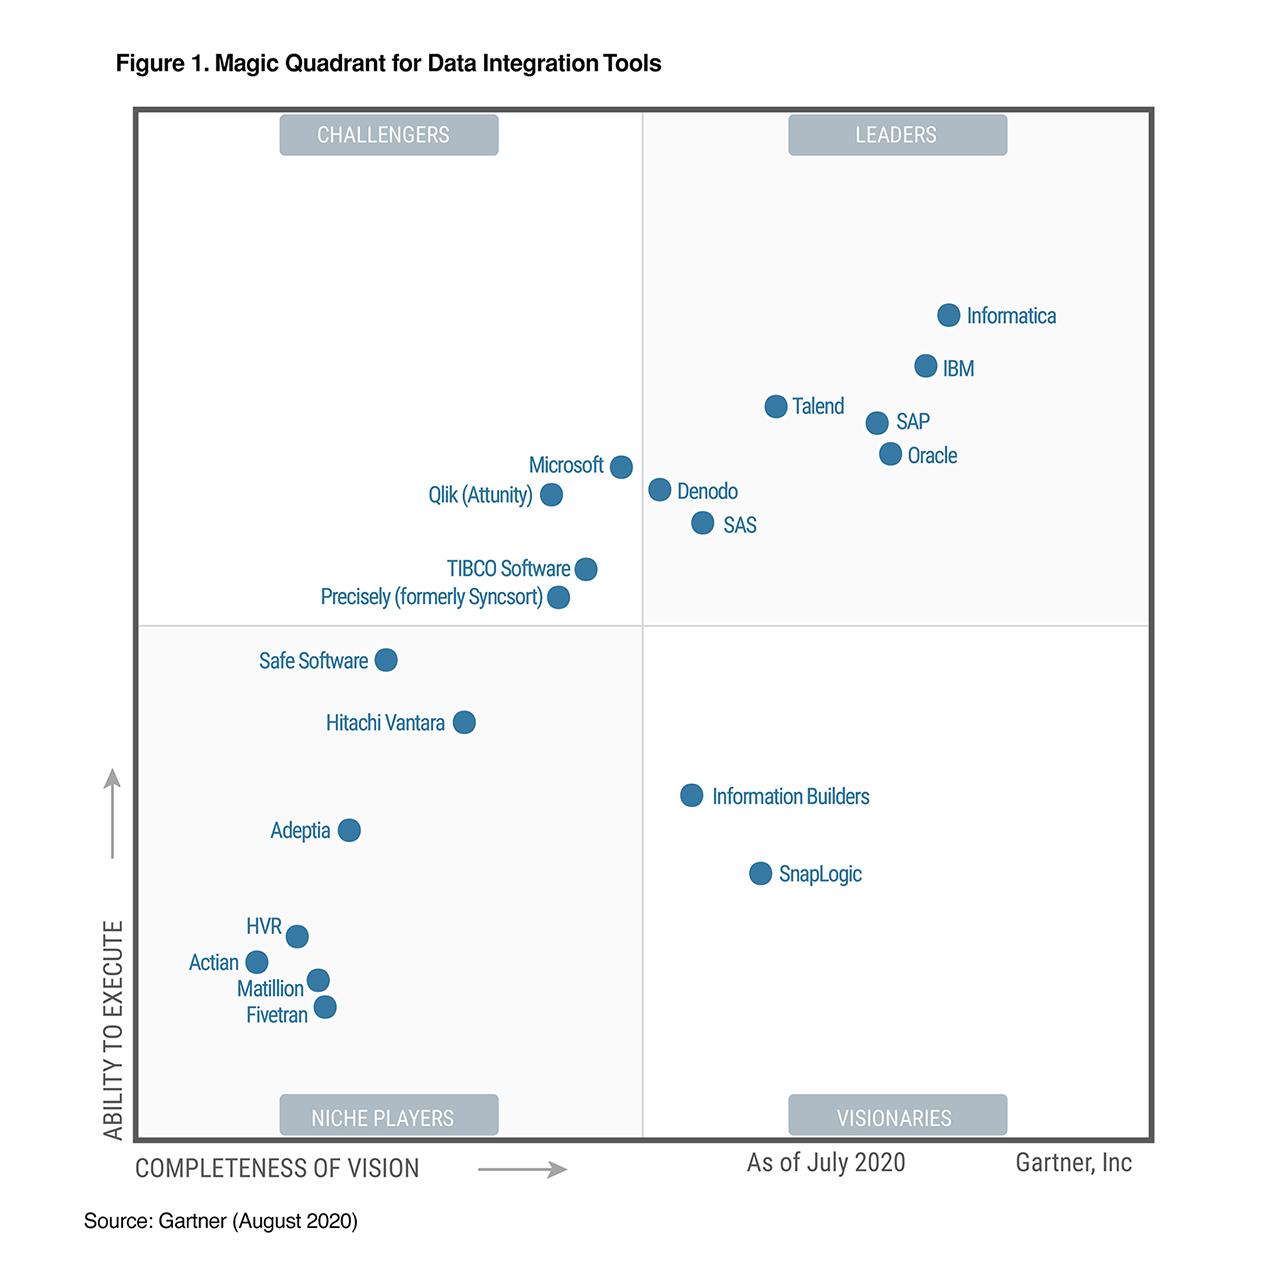 2020 Gartner Magic Quadrant For Data Integration Tools